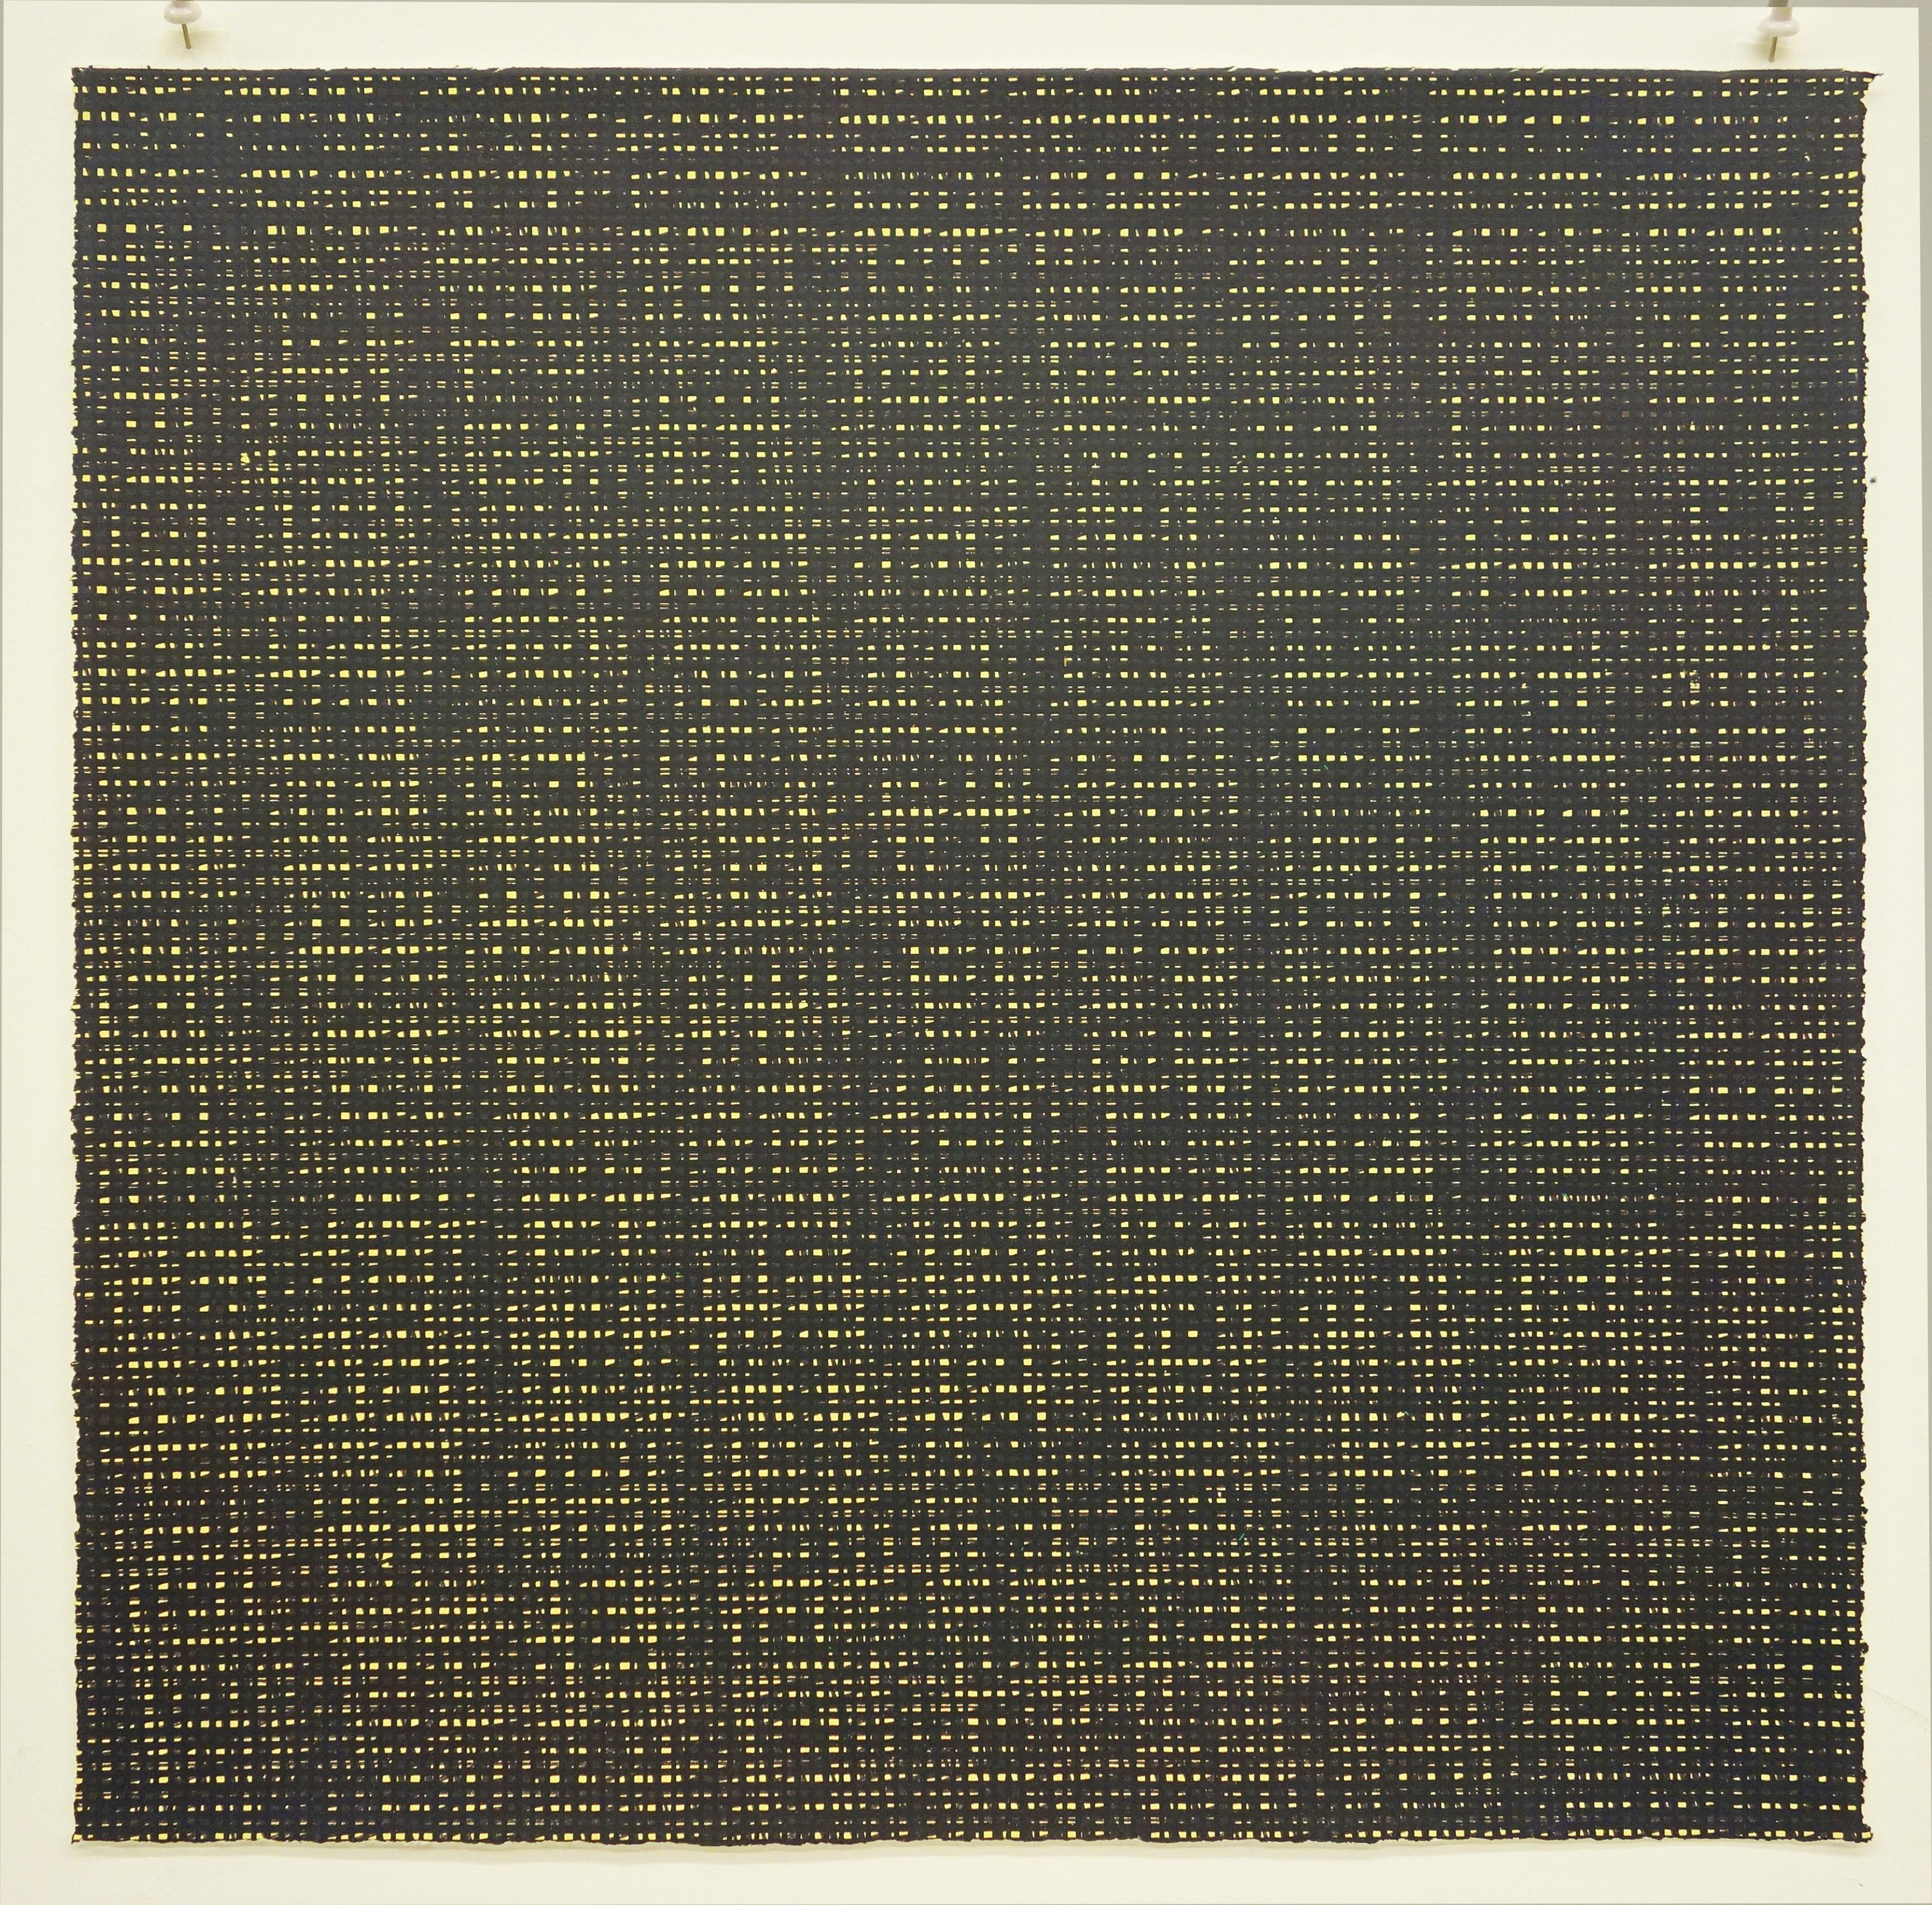 Rob de Oude, Untitled-Wassaic 1, 2016, silkscreen, 18 x 18 inches, Suite of 10